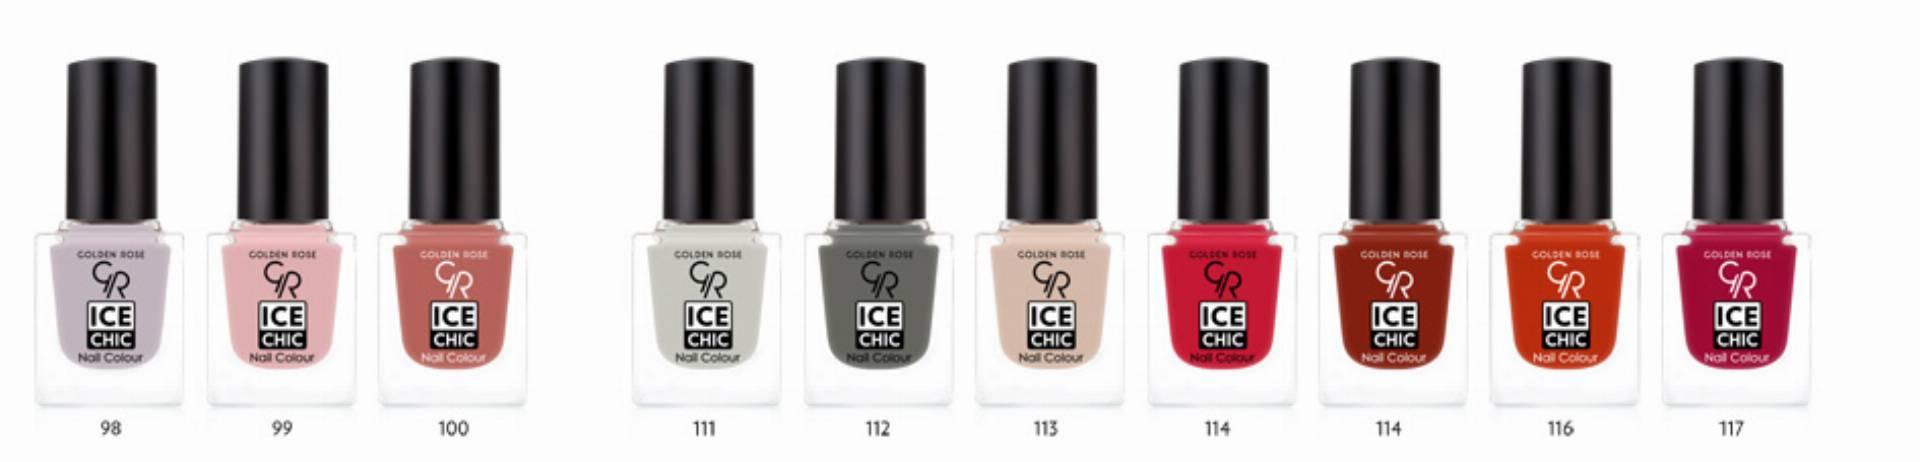 ice-chic-lakiery